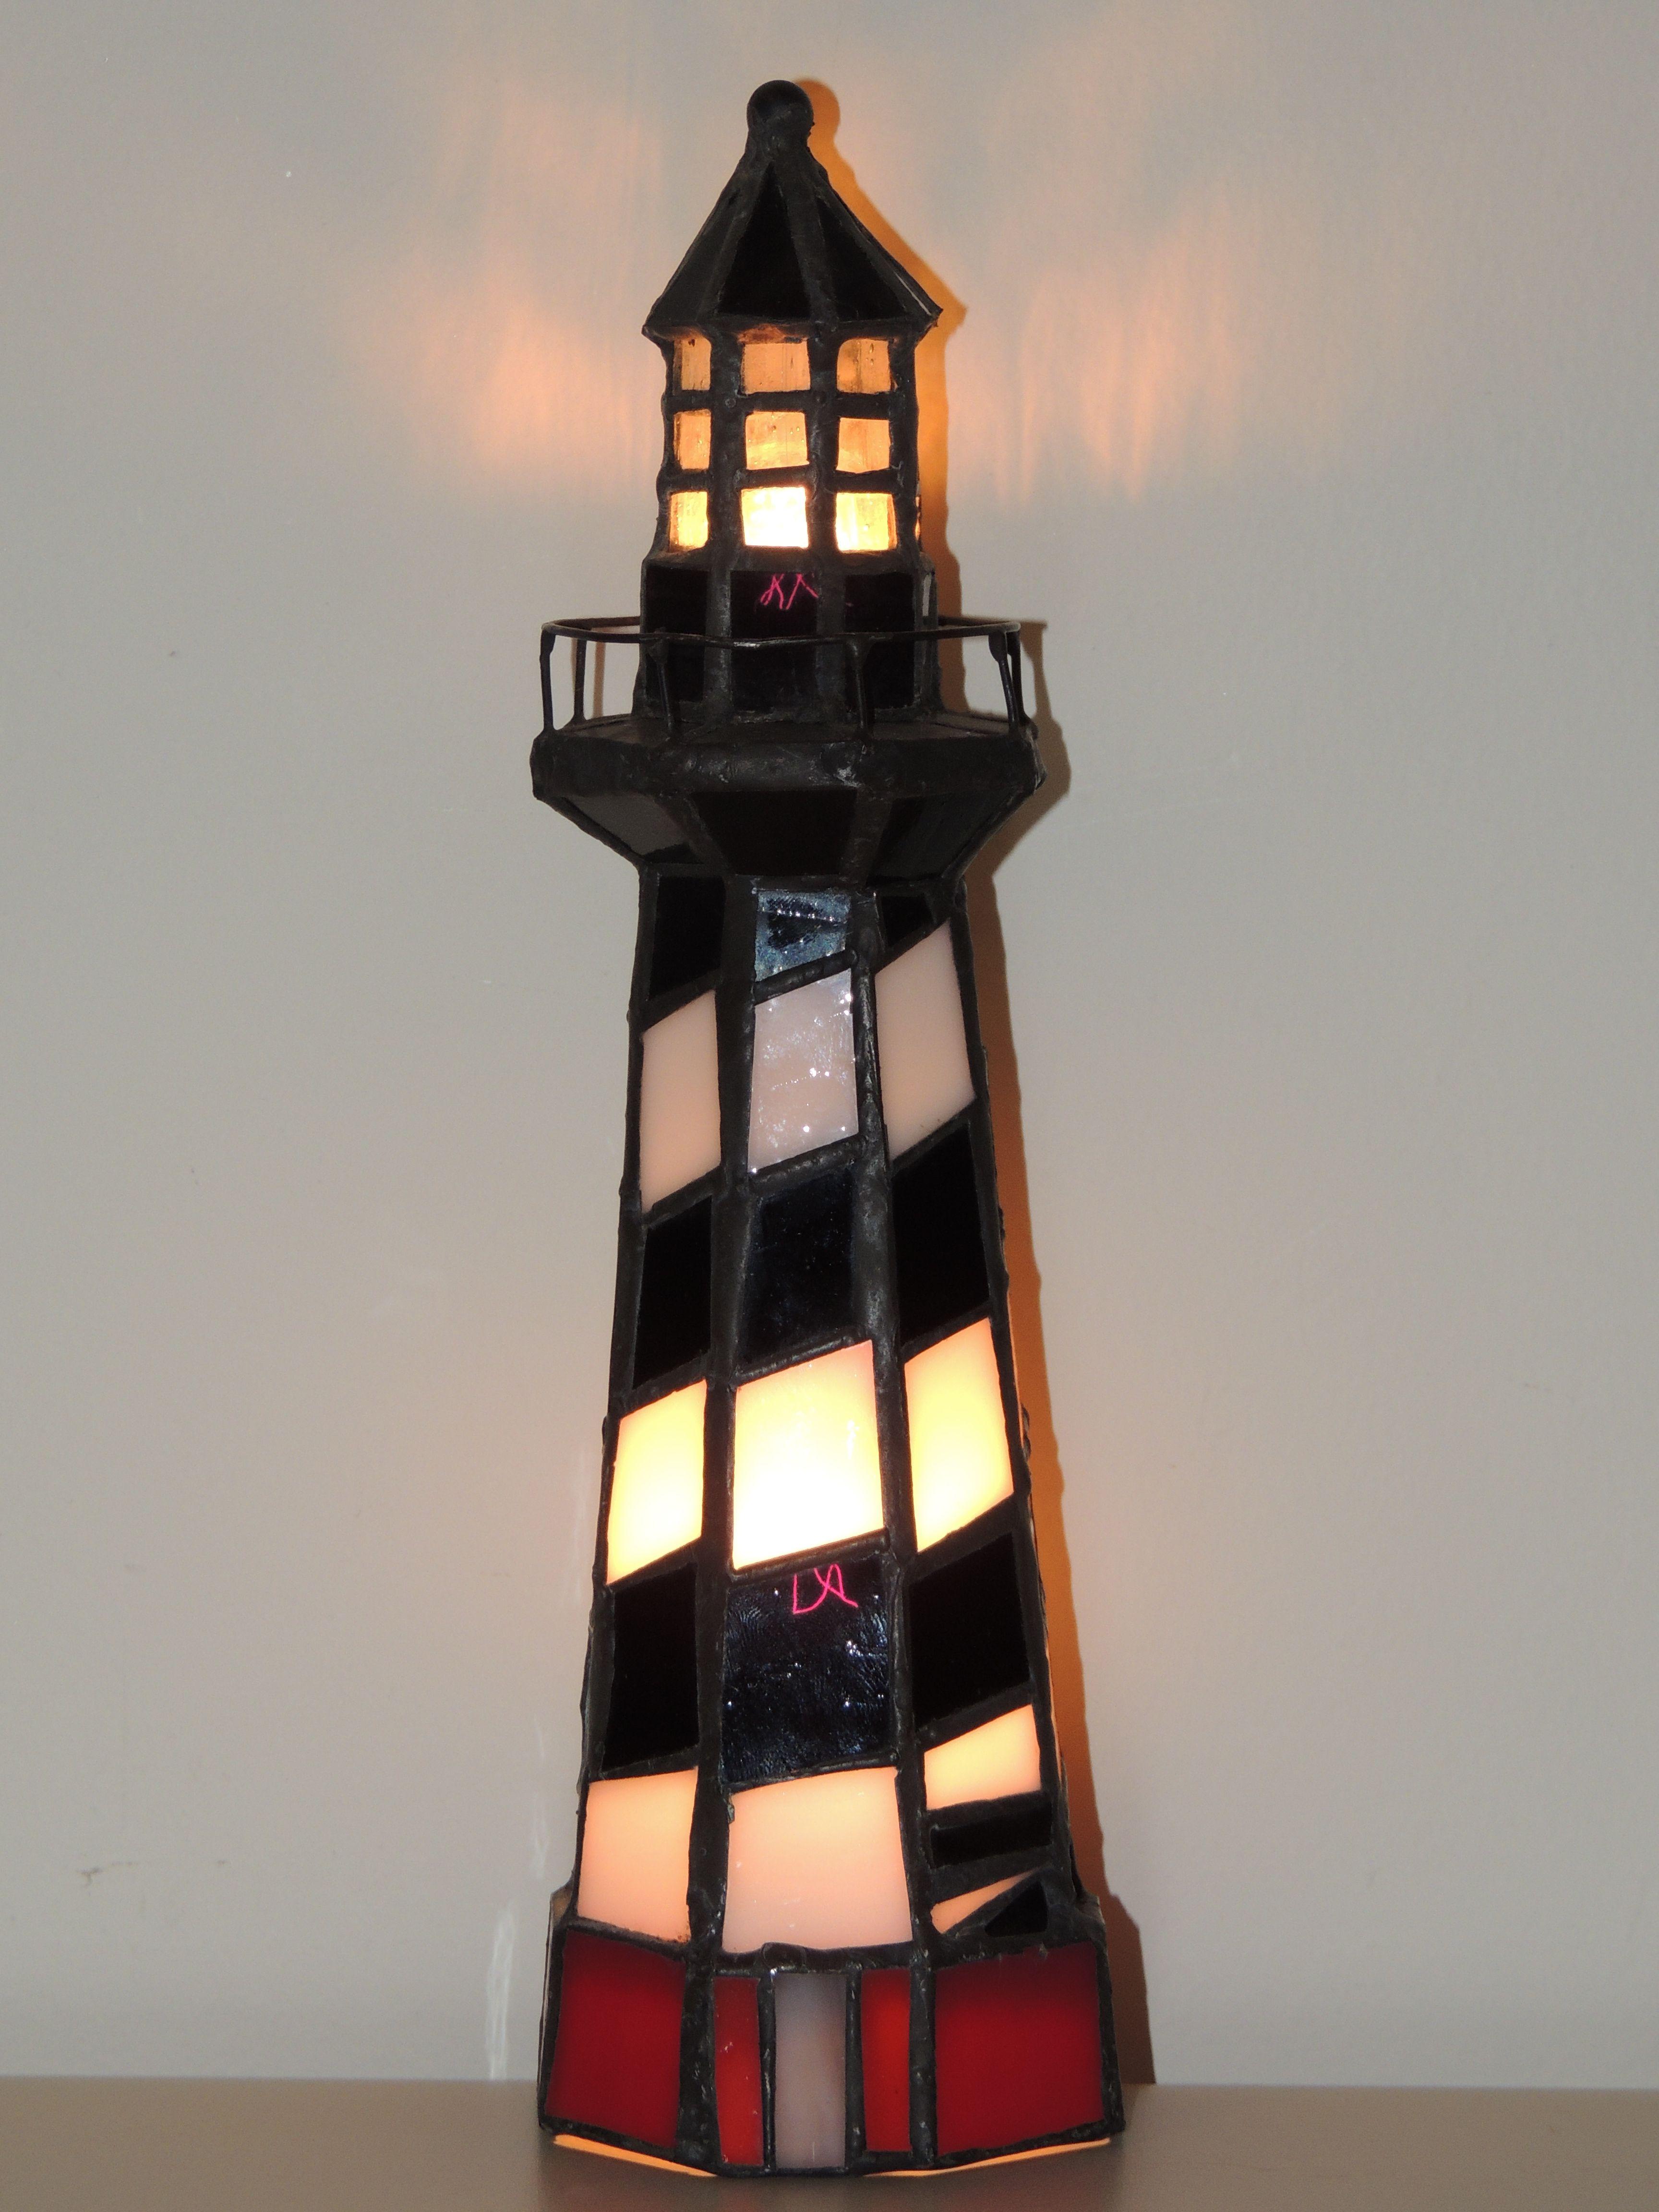 light lamp club decor lamps vintage house lighthouse antique table mycrimea